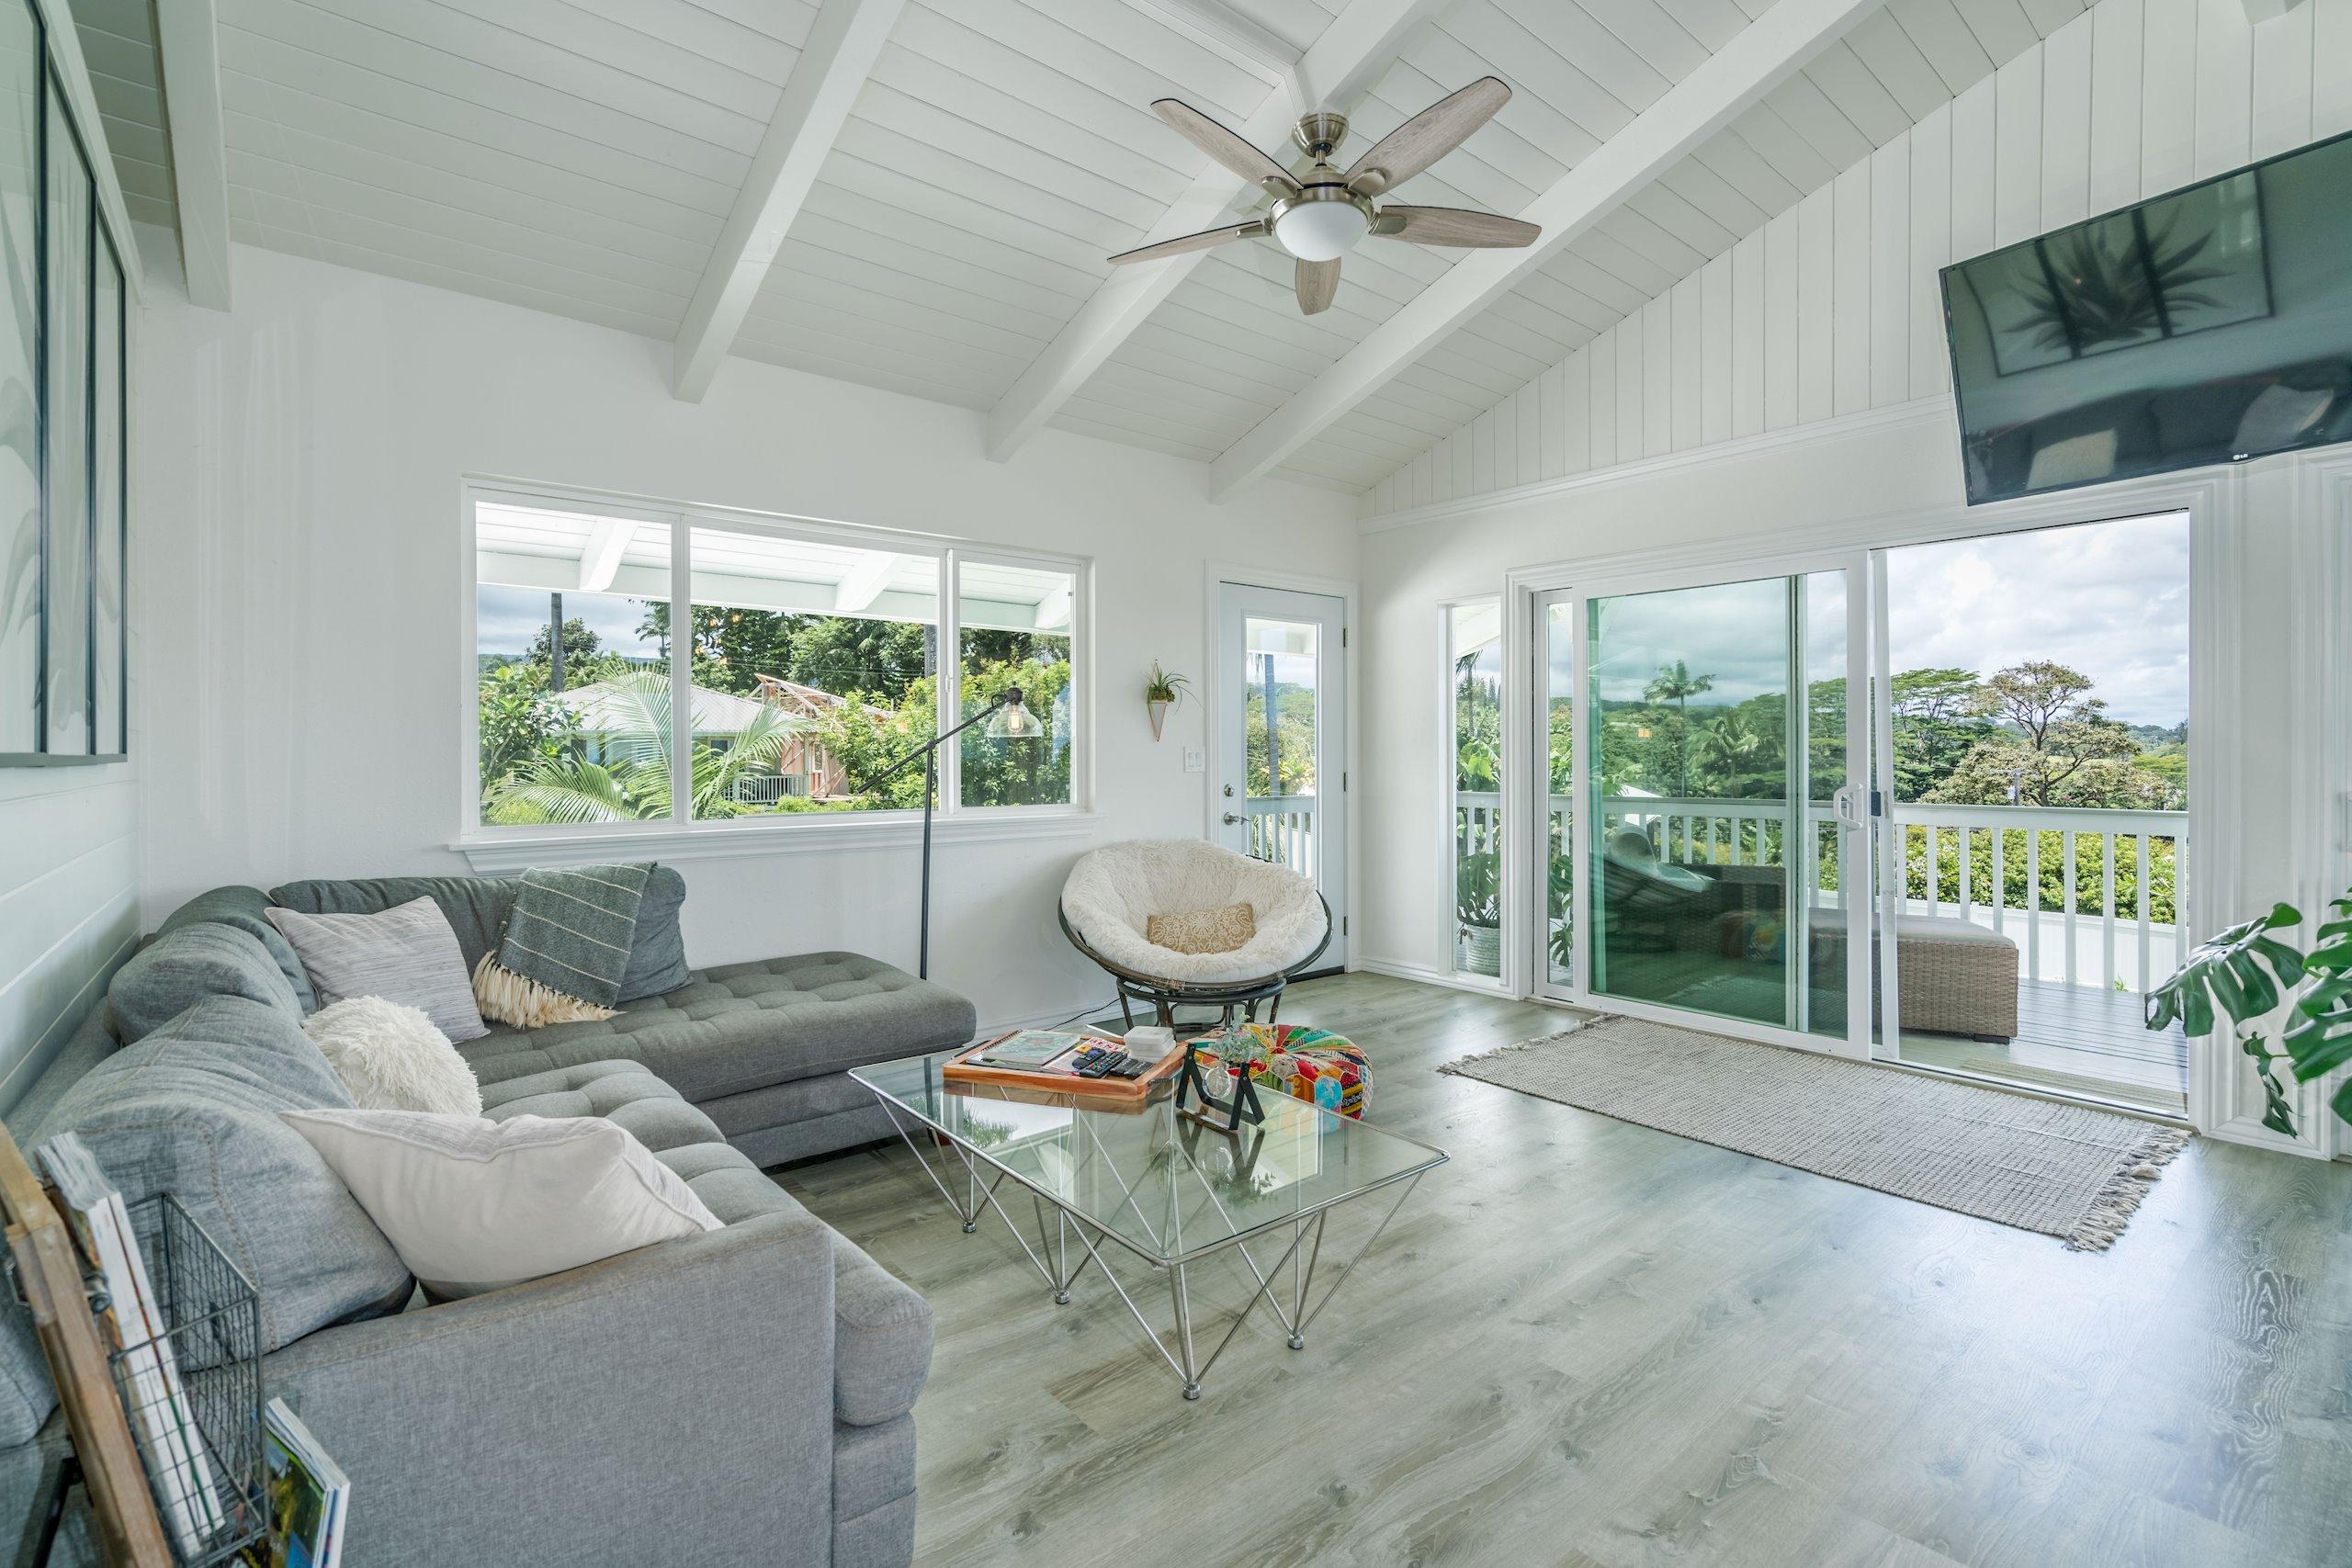 Gorgeous cool-white ship lap textured walls in the kitchen/entertainment room create a beachy farmhouse vibe.